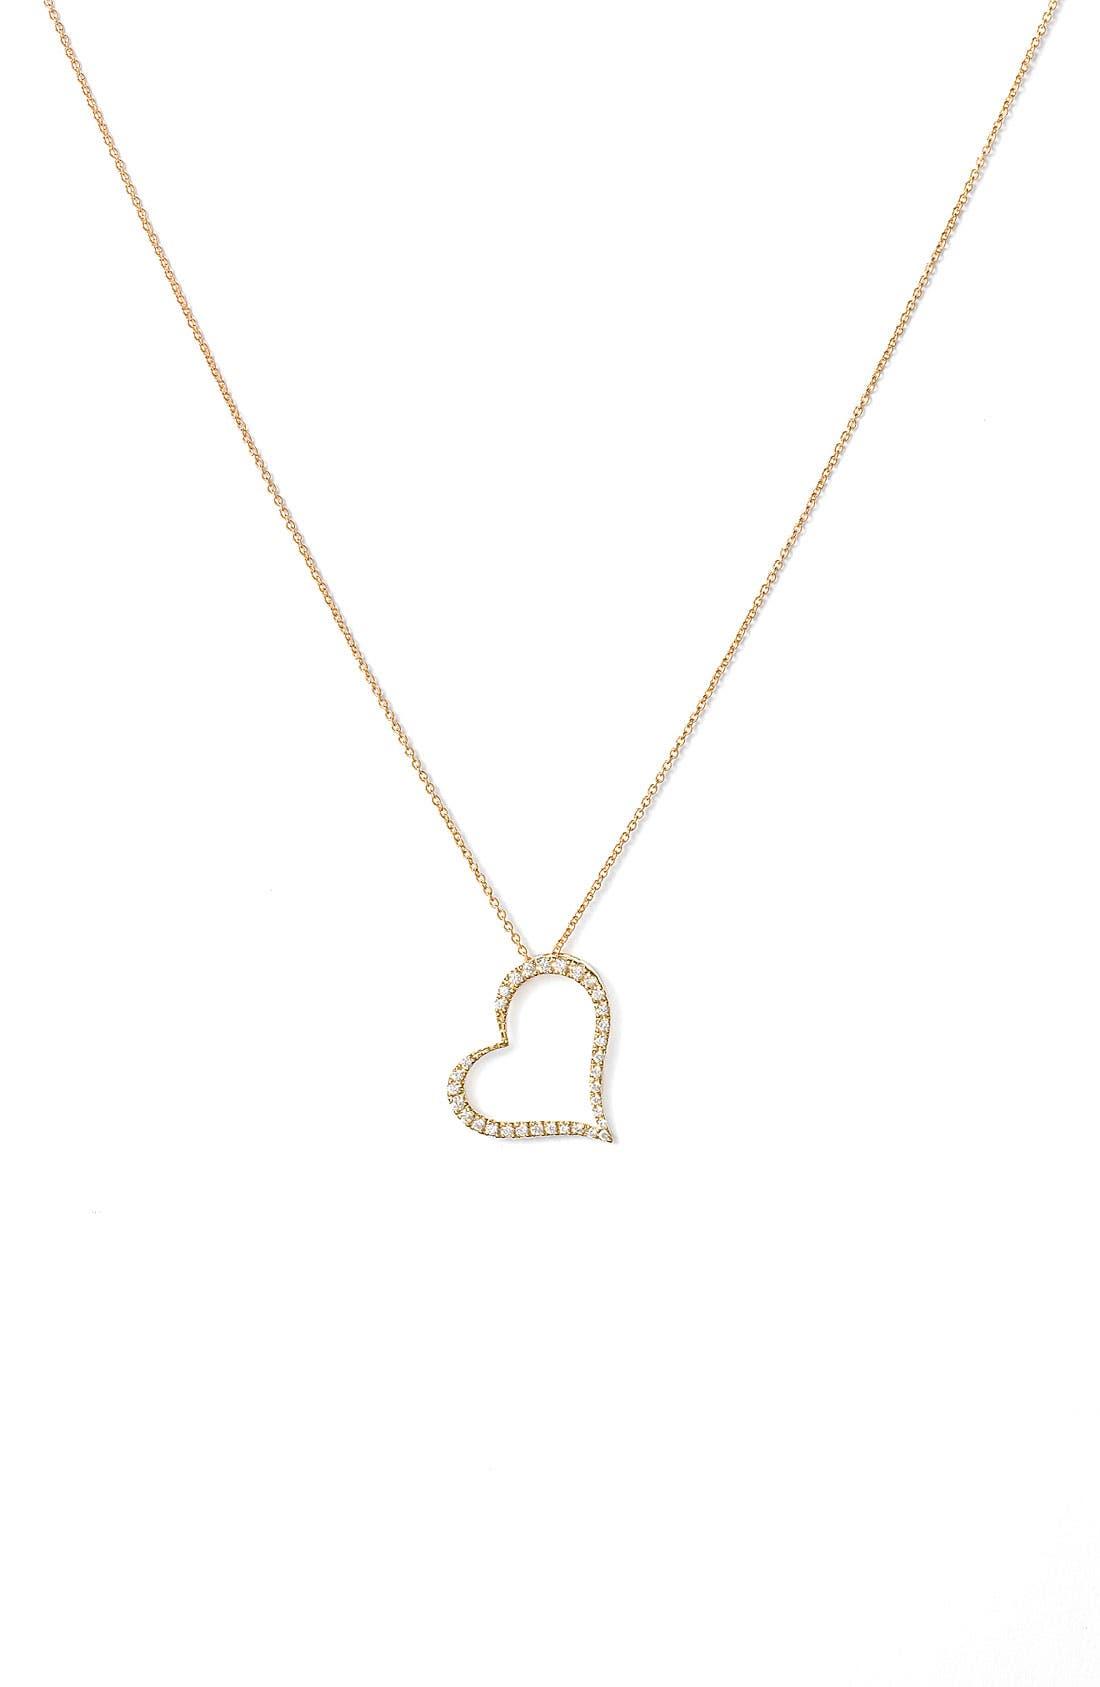 Slanted Diamond Heart Pendant Necklace,                         Main,                         color, YELLOW GOLD